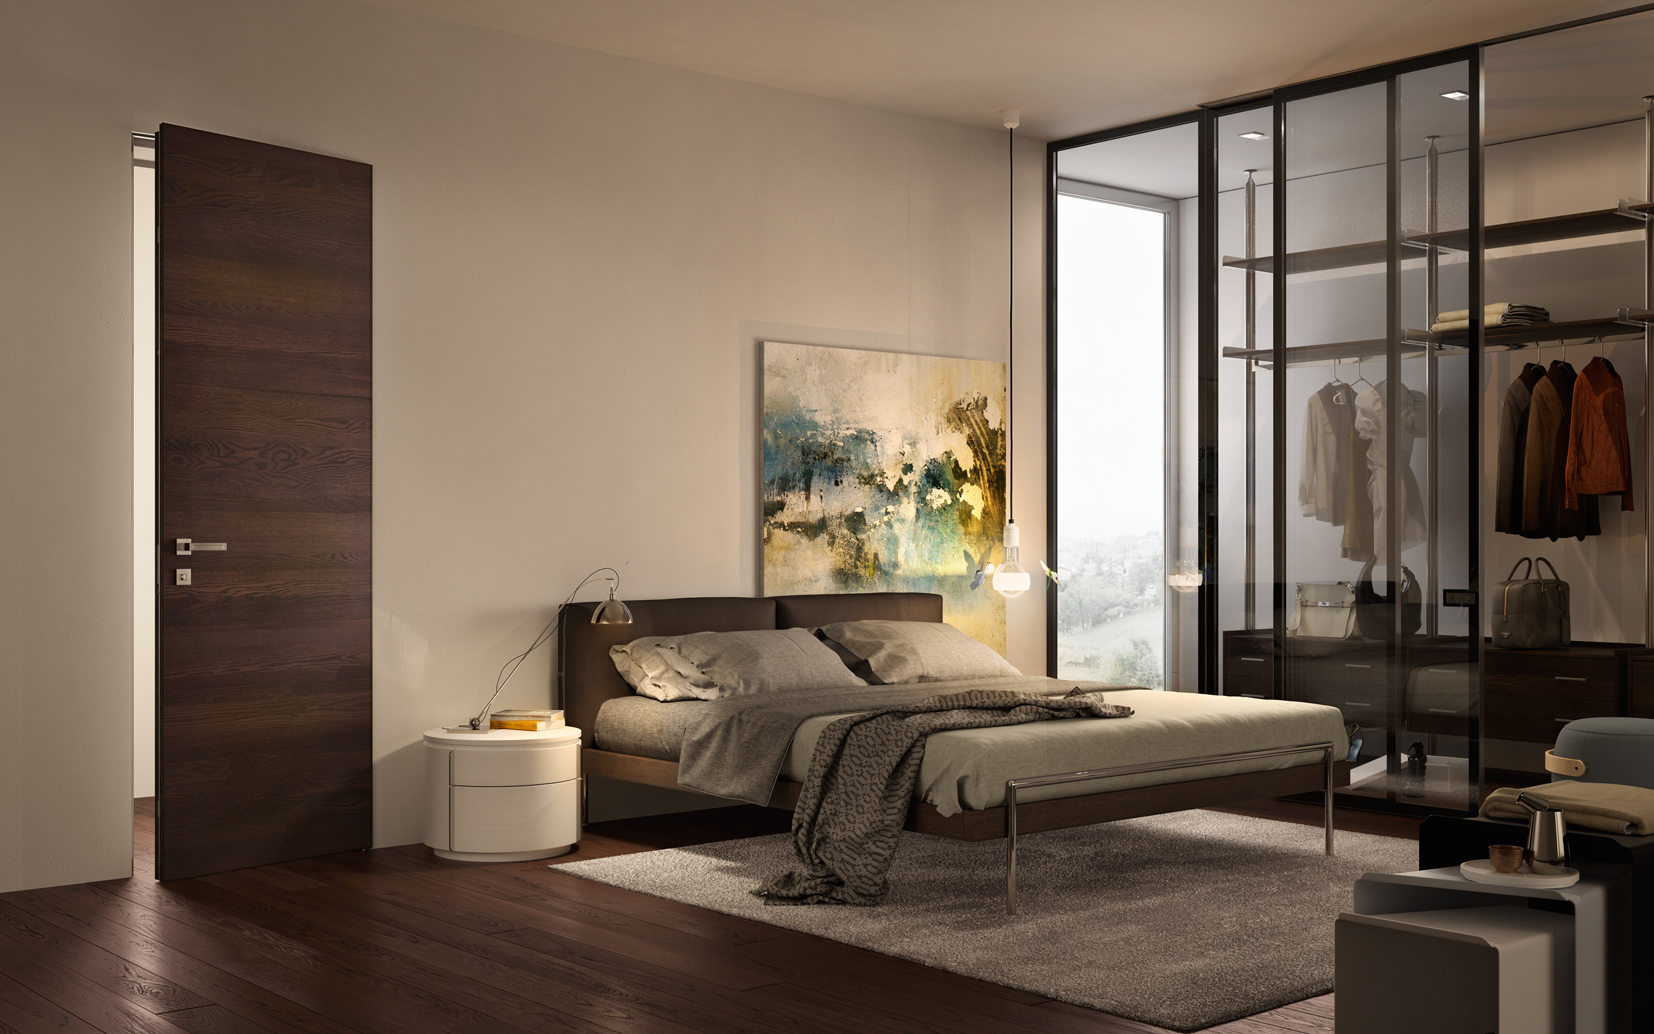 Sovrana villa moderna camera da letto - Garofoli